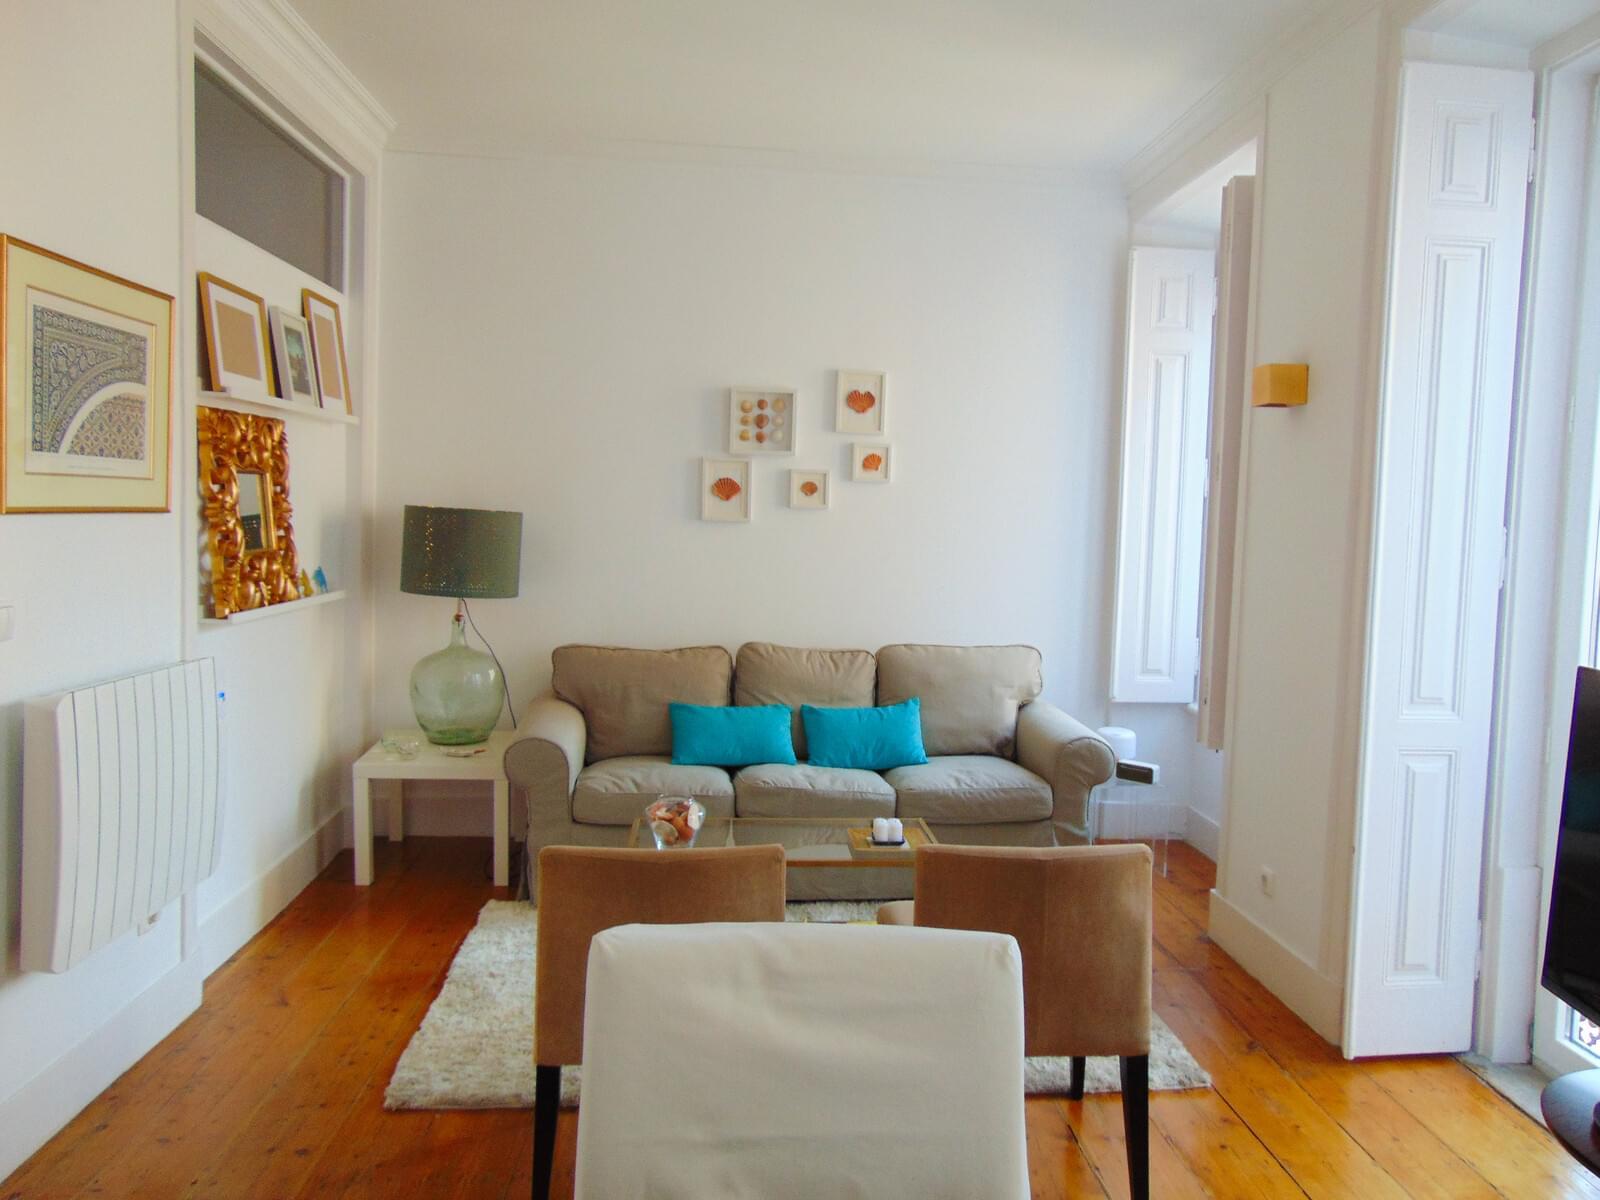 pf18269-apartamento-t1-lisboa-ba2e46ba-8912-40bf-9fcd-090cb626d58b